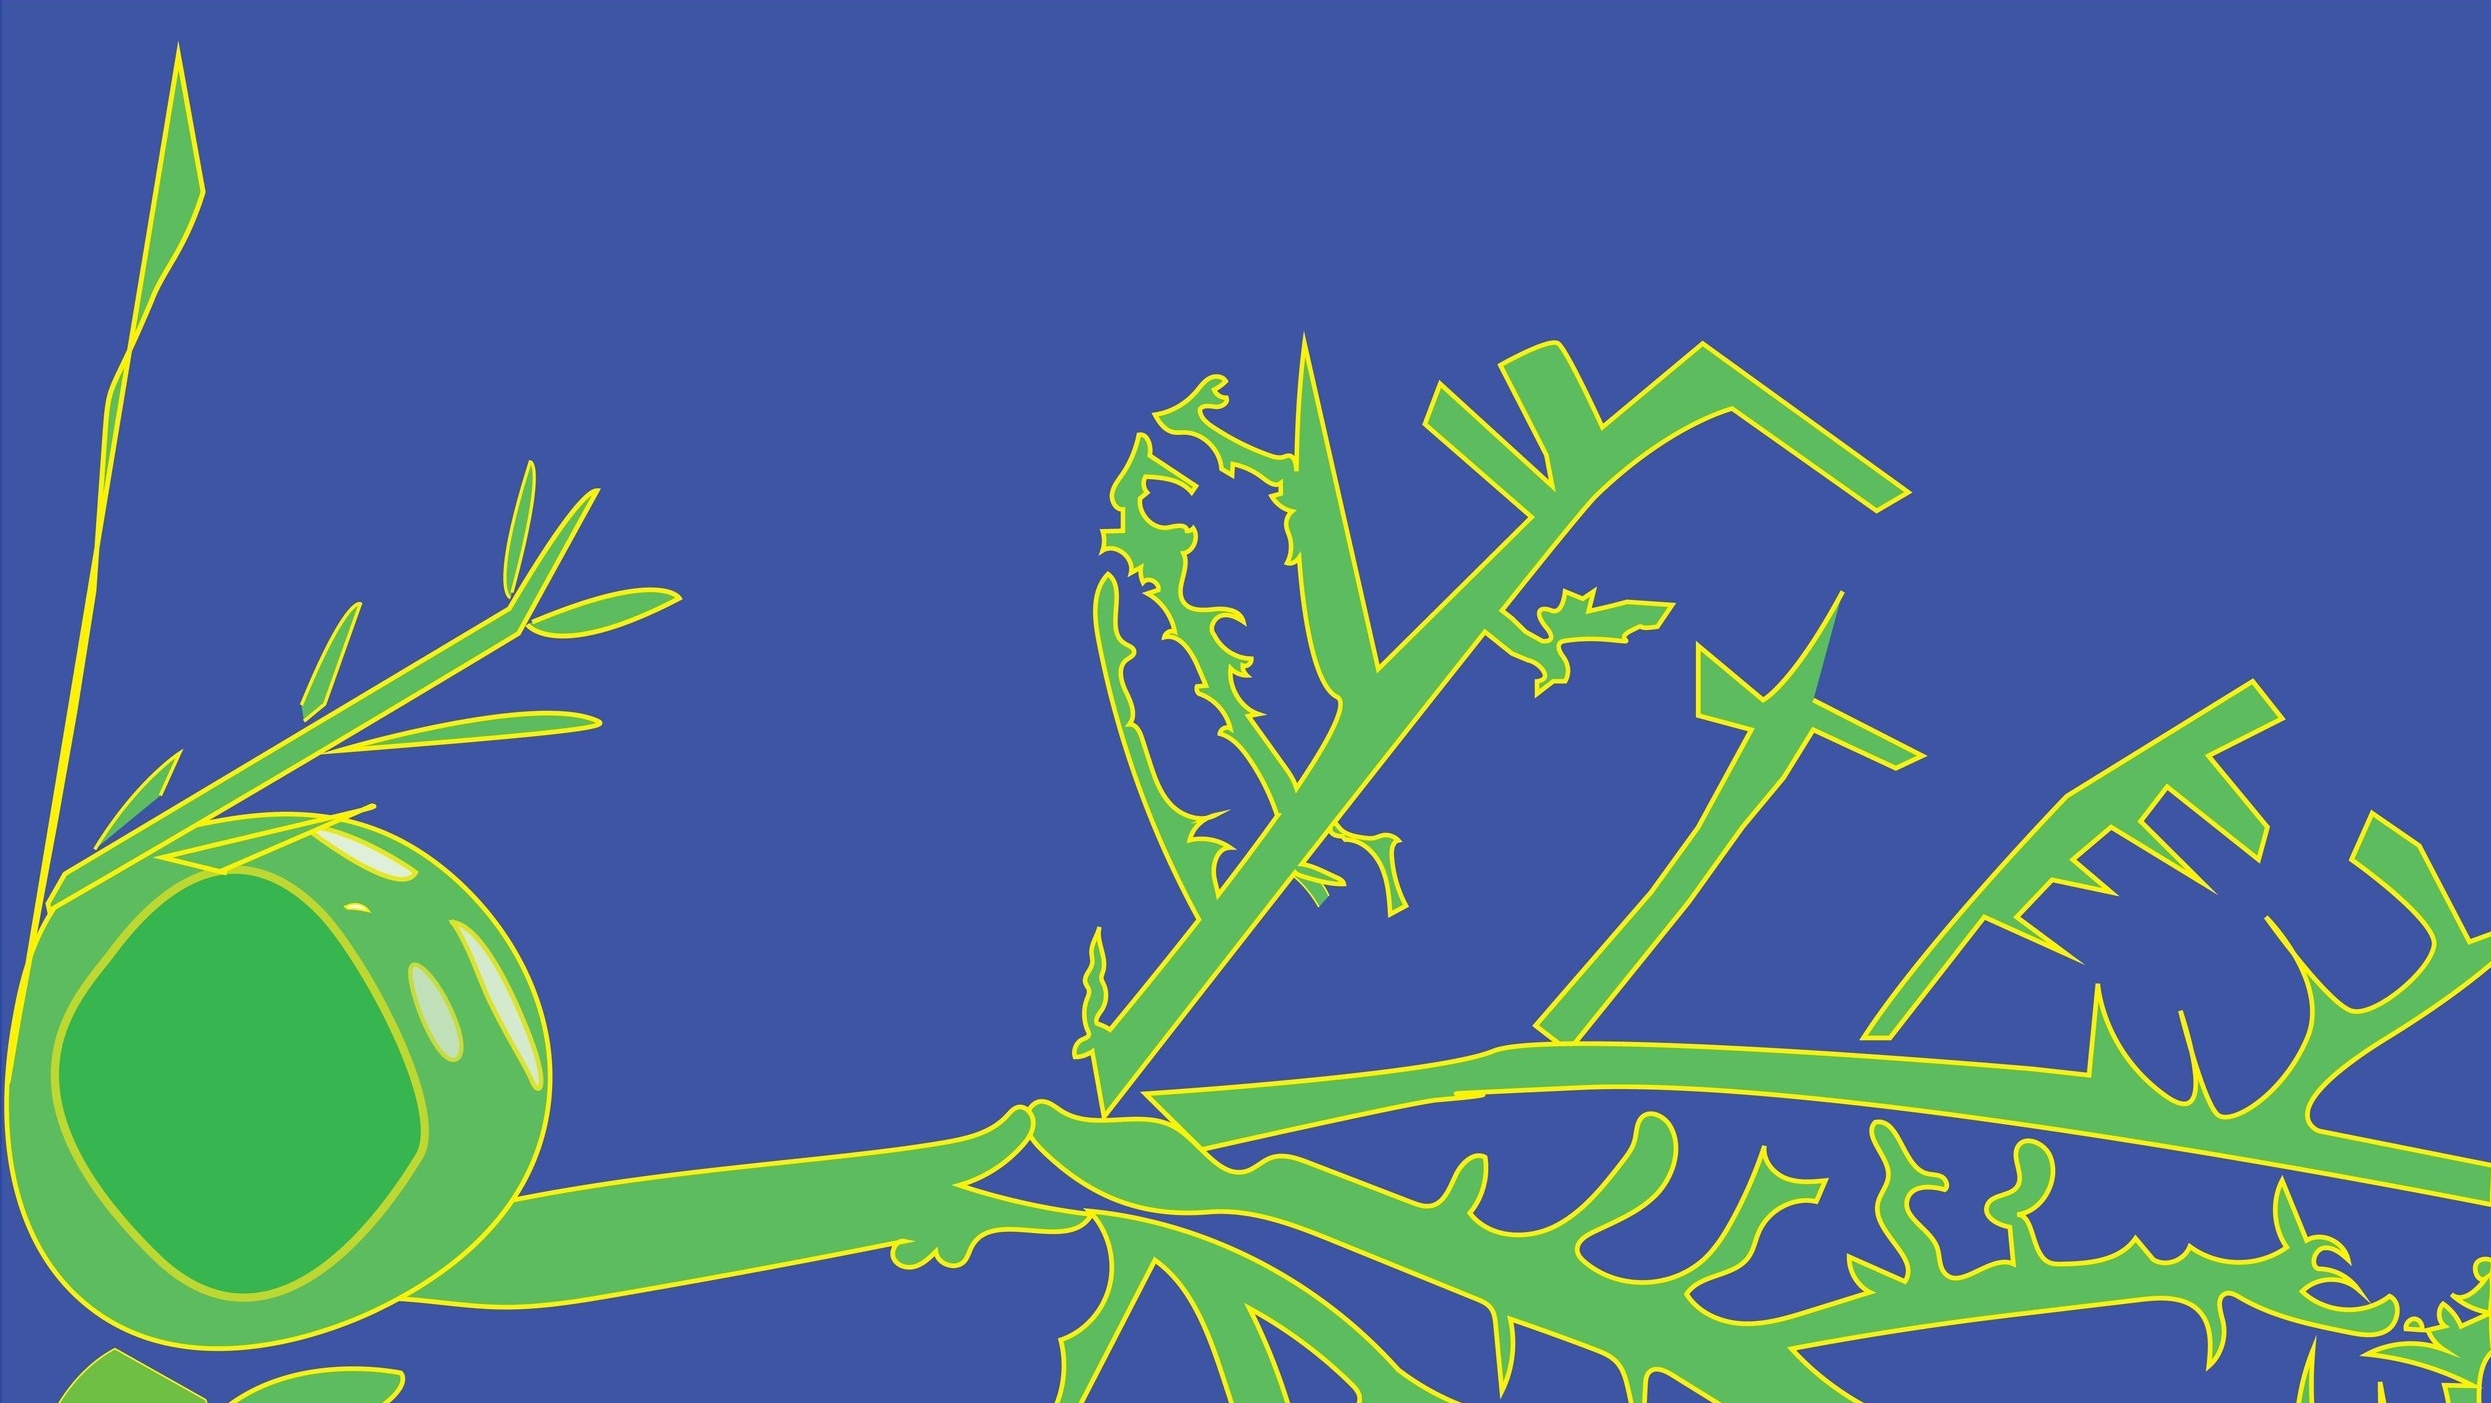 leaf final 12.15l.jpg